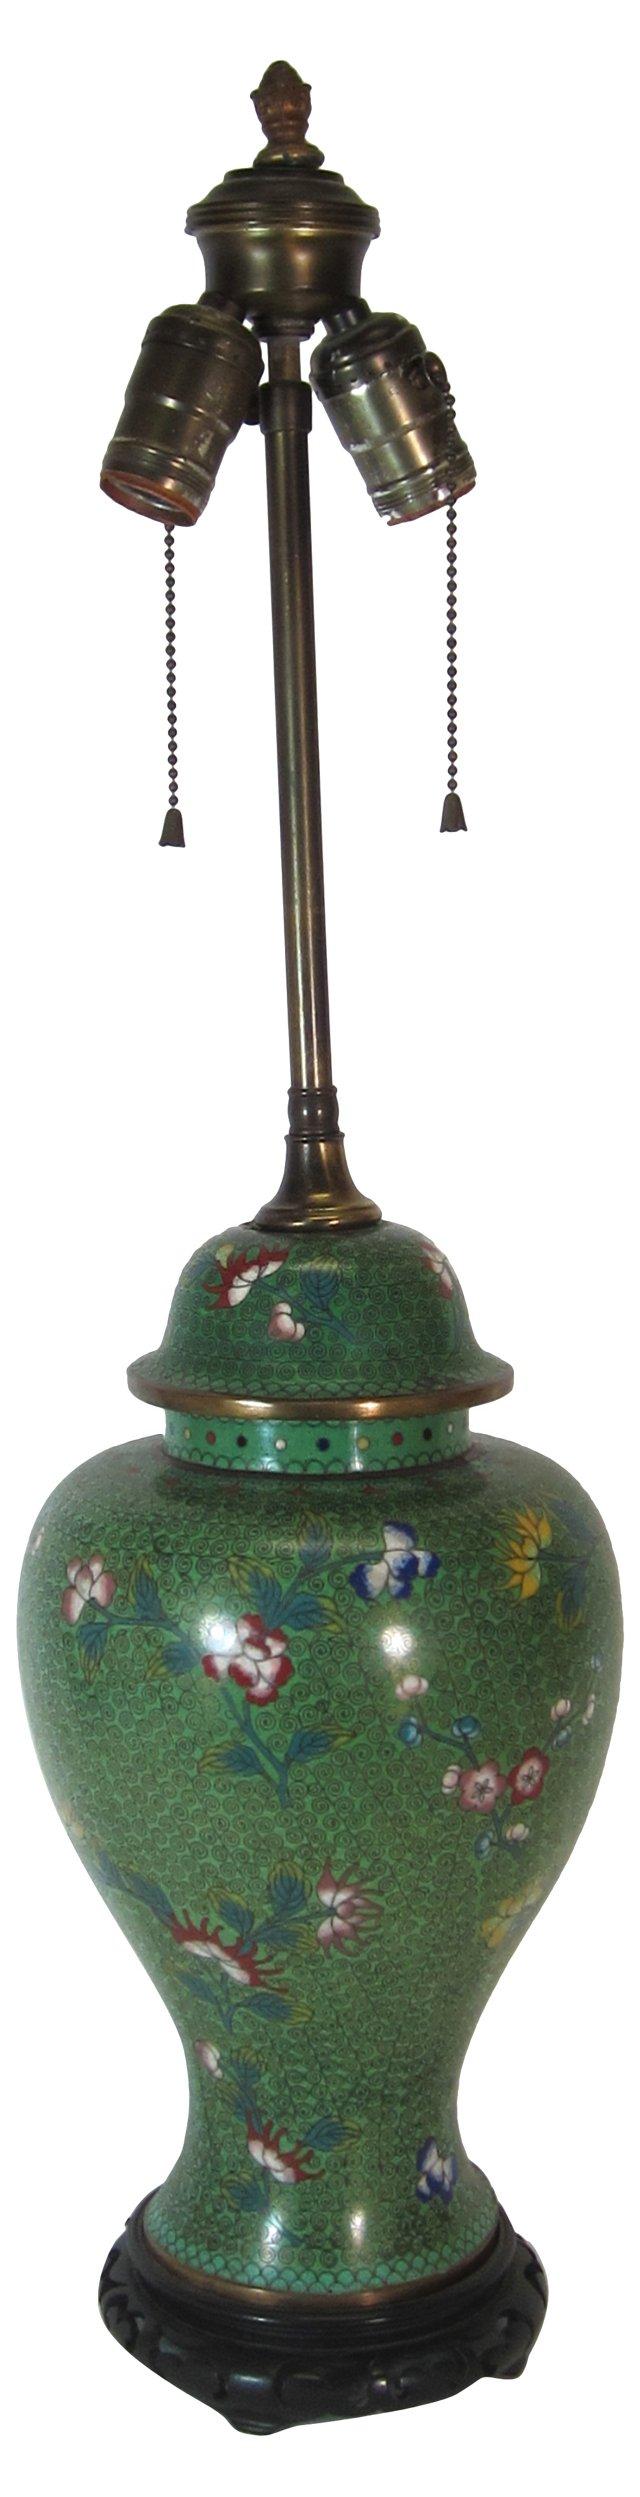 1920s Cloisonné Ginger Jar Lamp